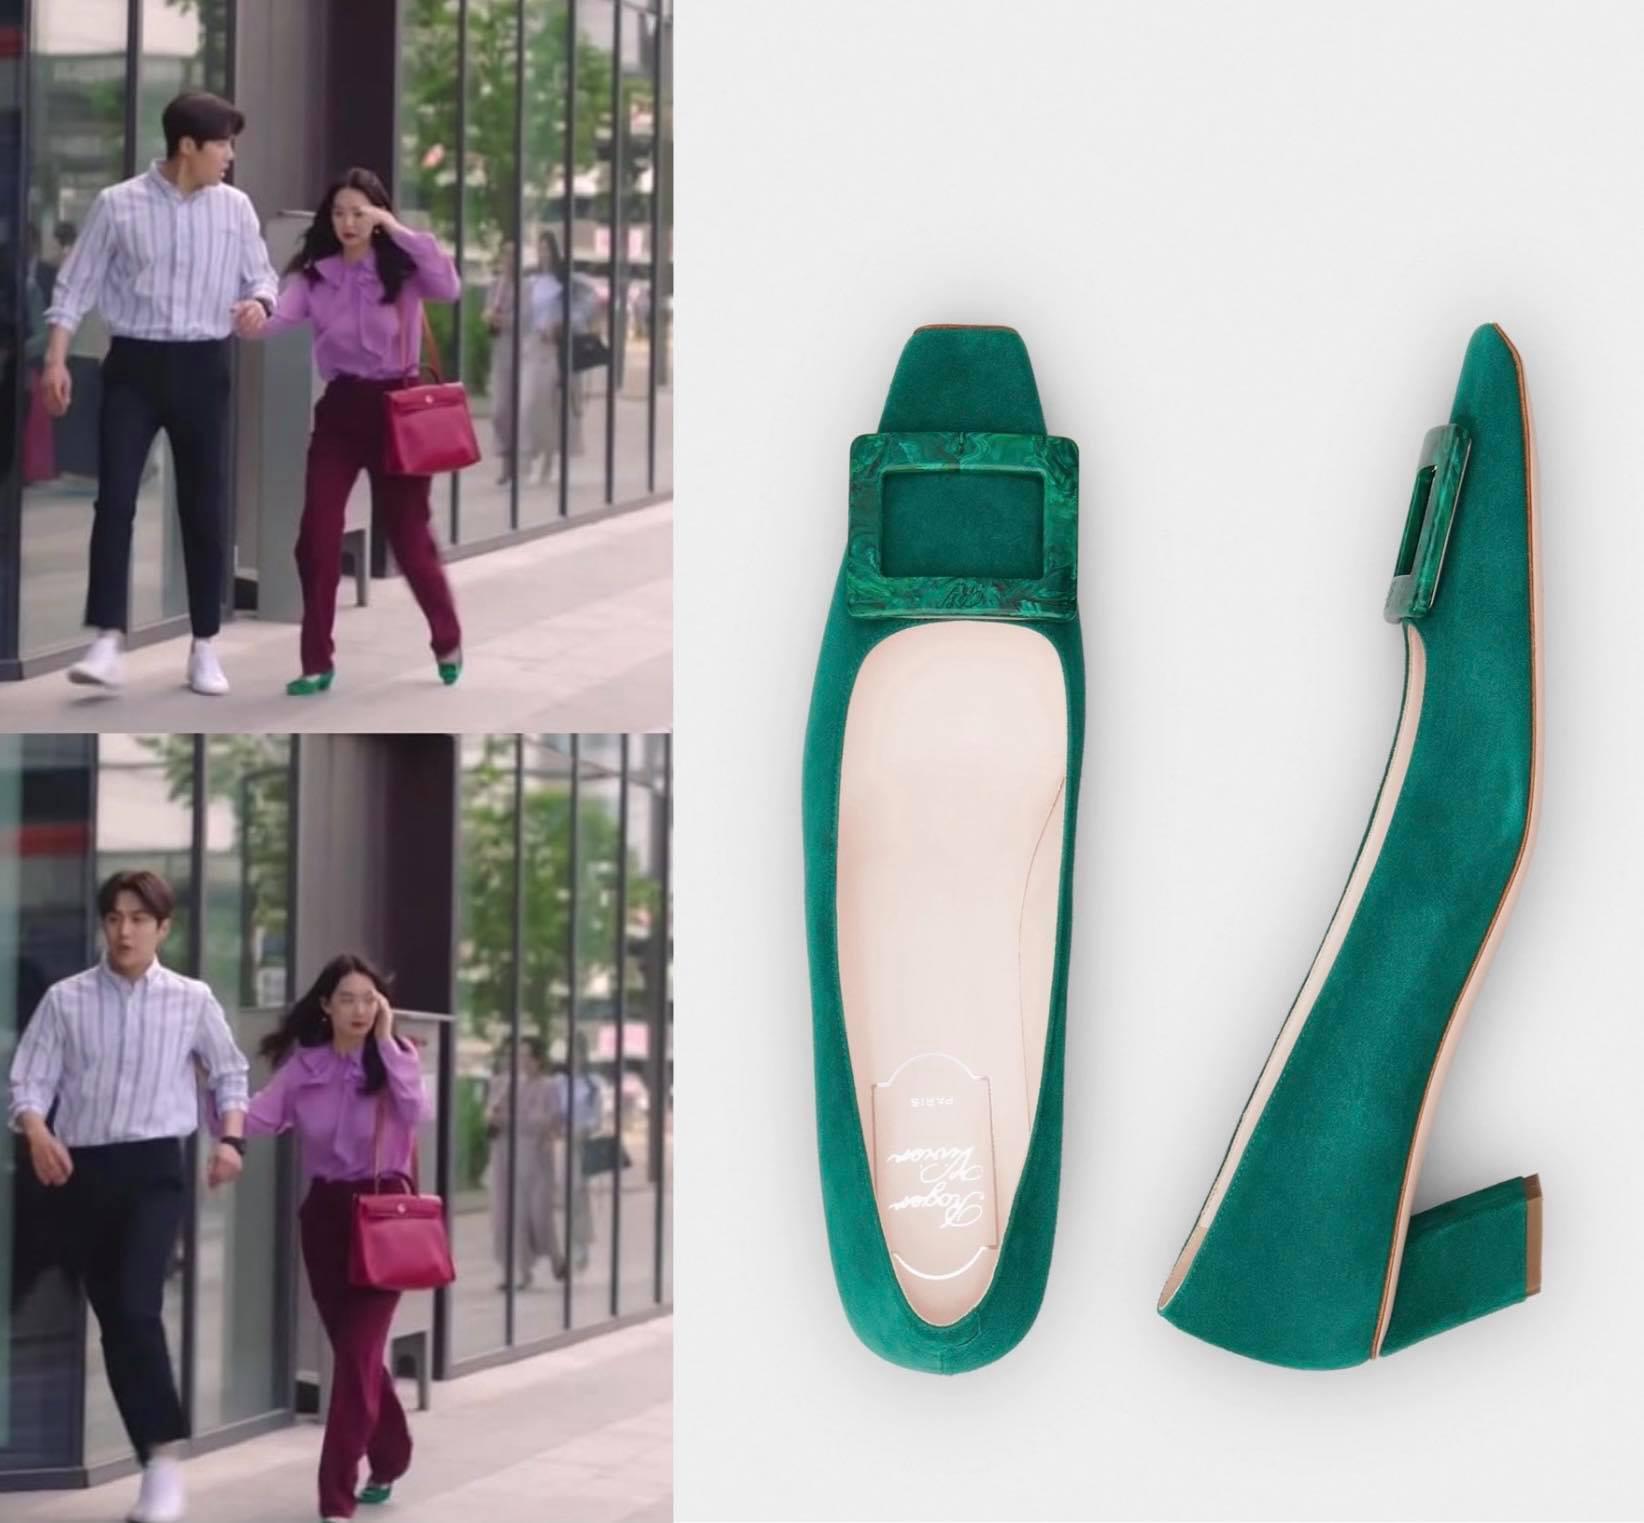 giày roger vivier xanh lá